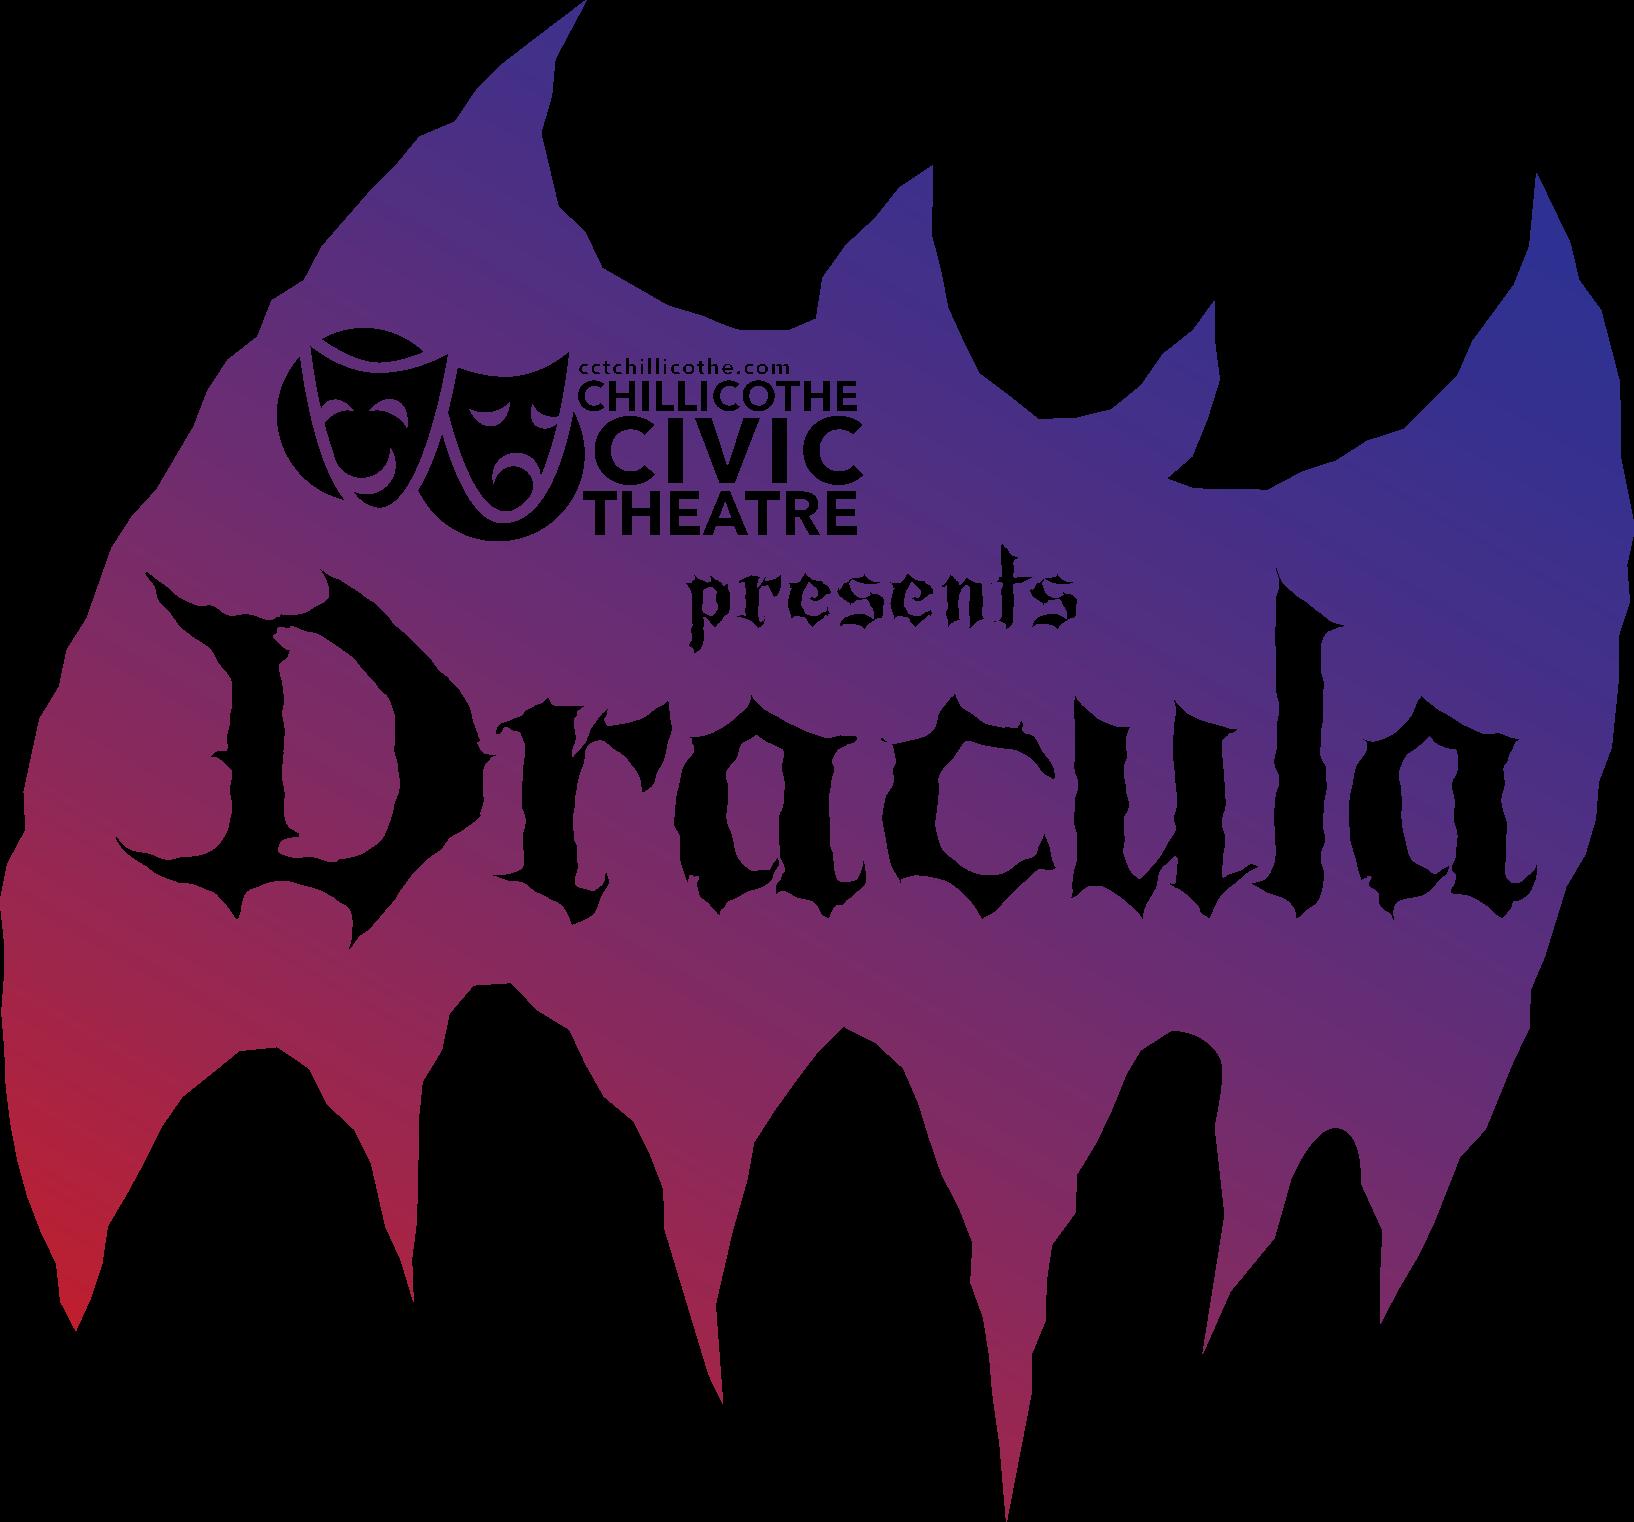 Dracula-Logo-color